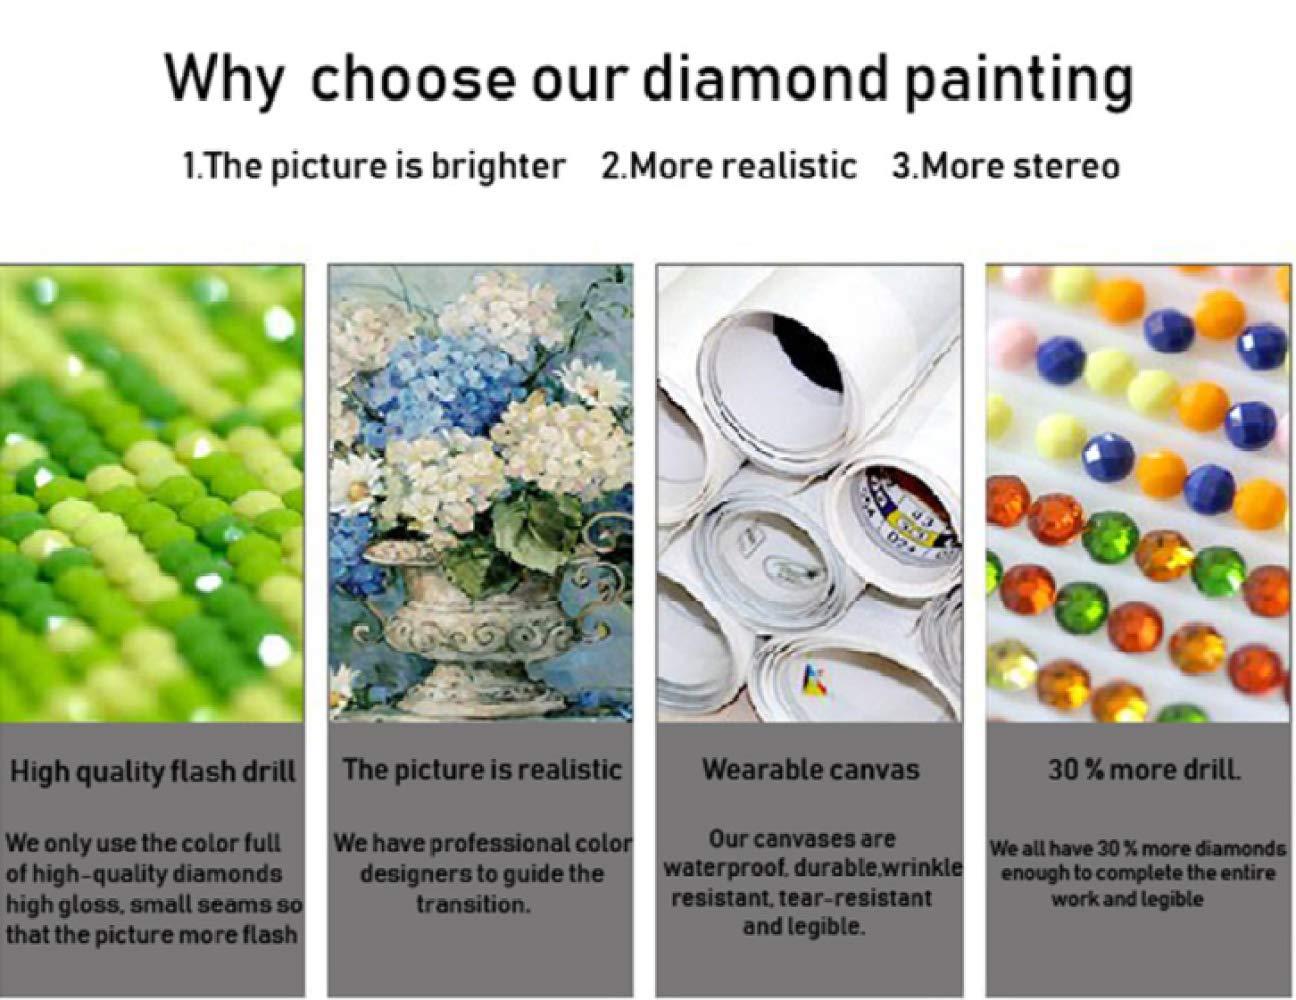 23Cm Dandelion Flower Diamond Picture of Rhinestone Diamond Embroidery 17 Diamond Drawing Gems Art Picture Embroidery DIY 5D Diamond Painting